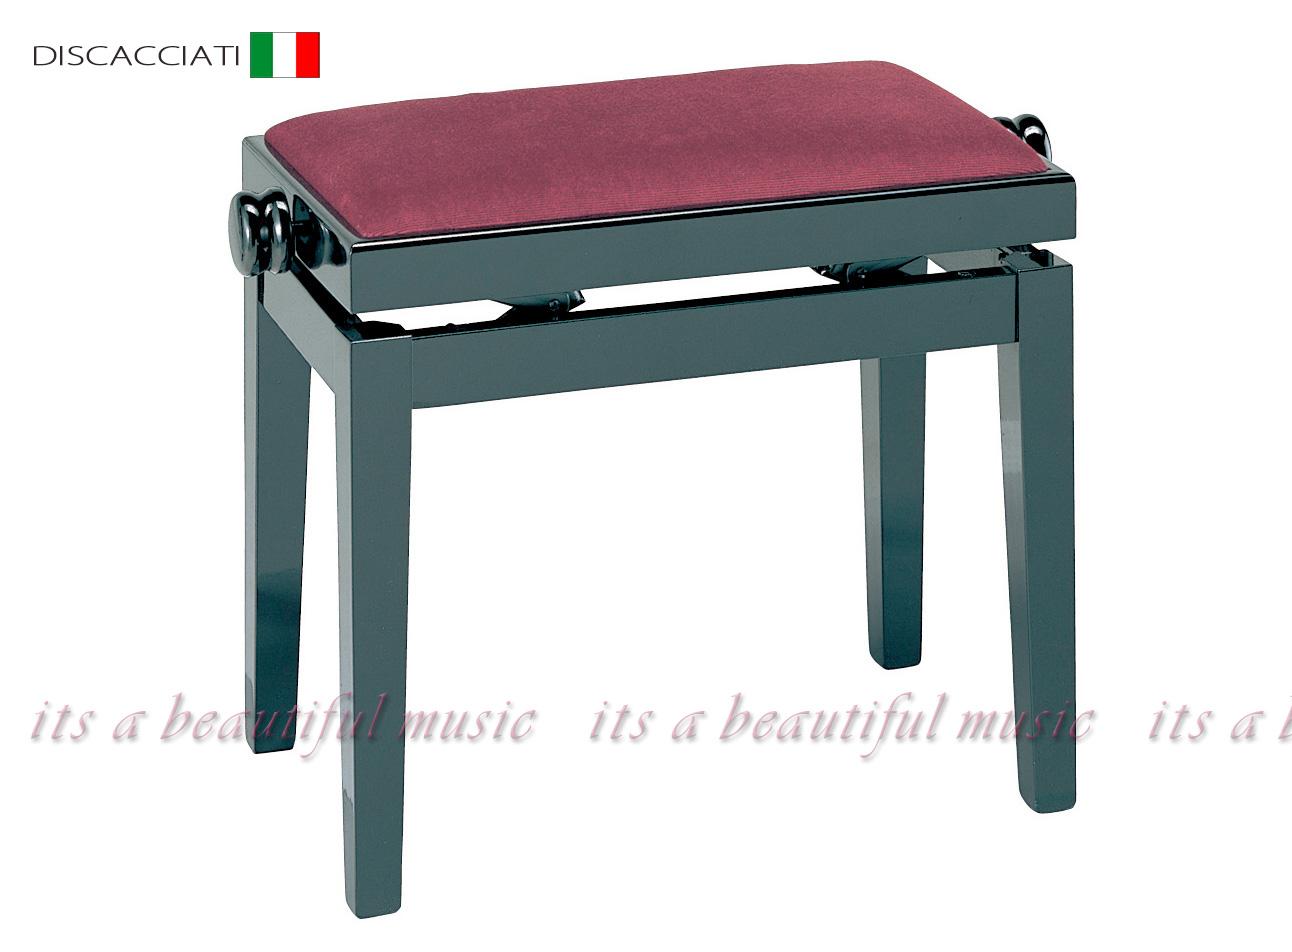 【its】高級輸入ピアノ椅子・イタリアディスカチャーチ社No.105(黒色)